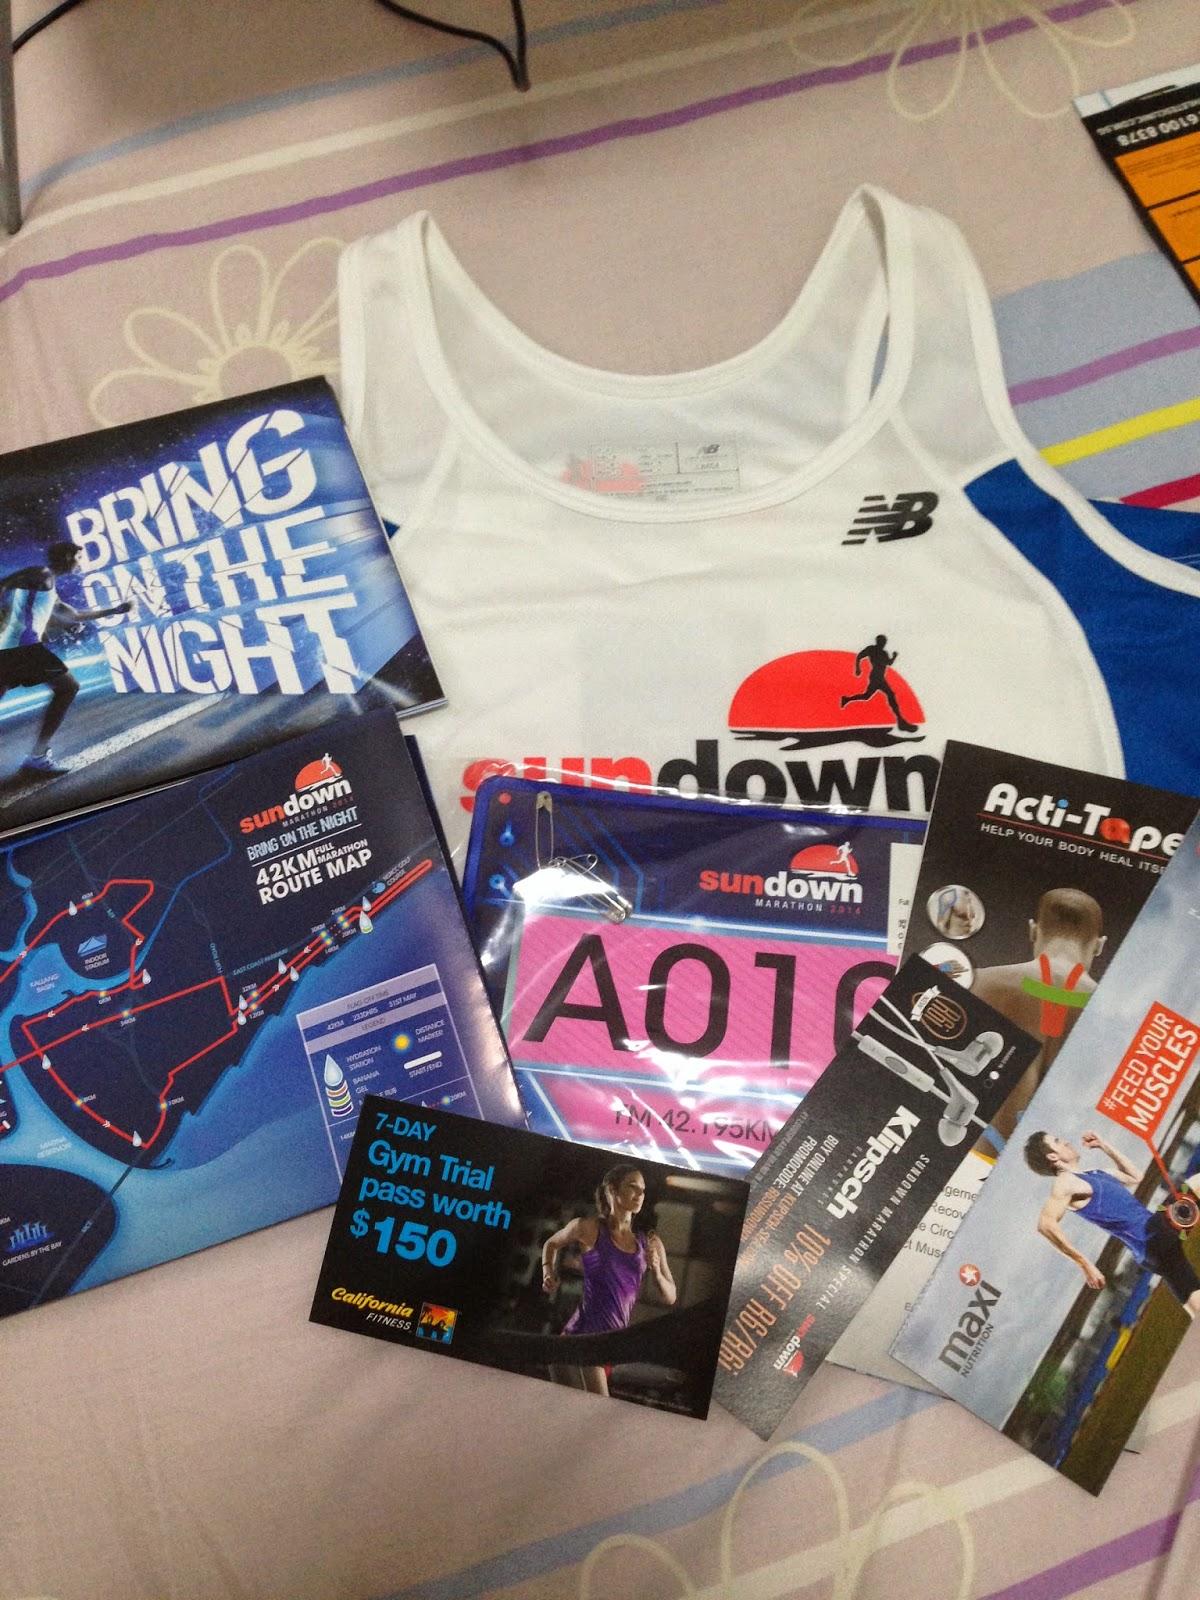 Sundown Marathon 2014 Race Pack Collection, heartsbeeping.blogspot.com